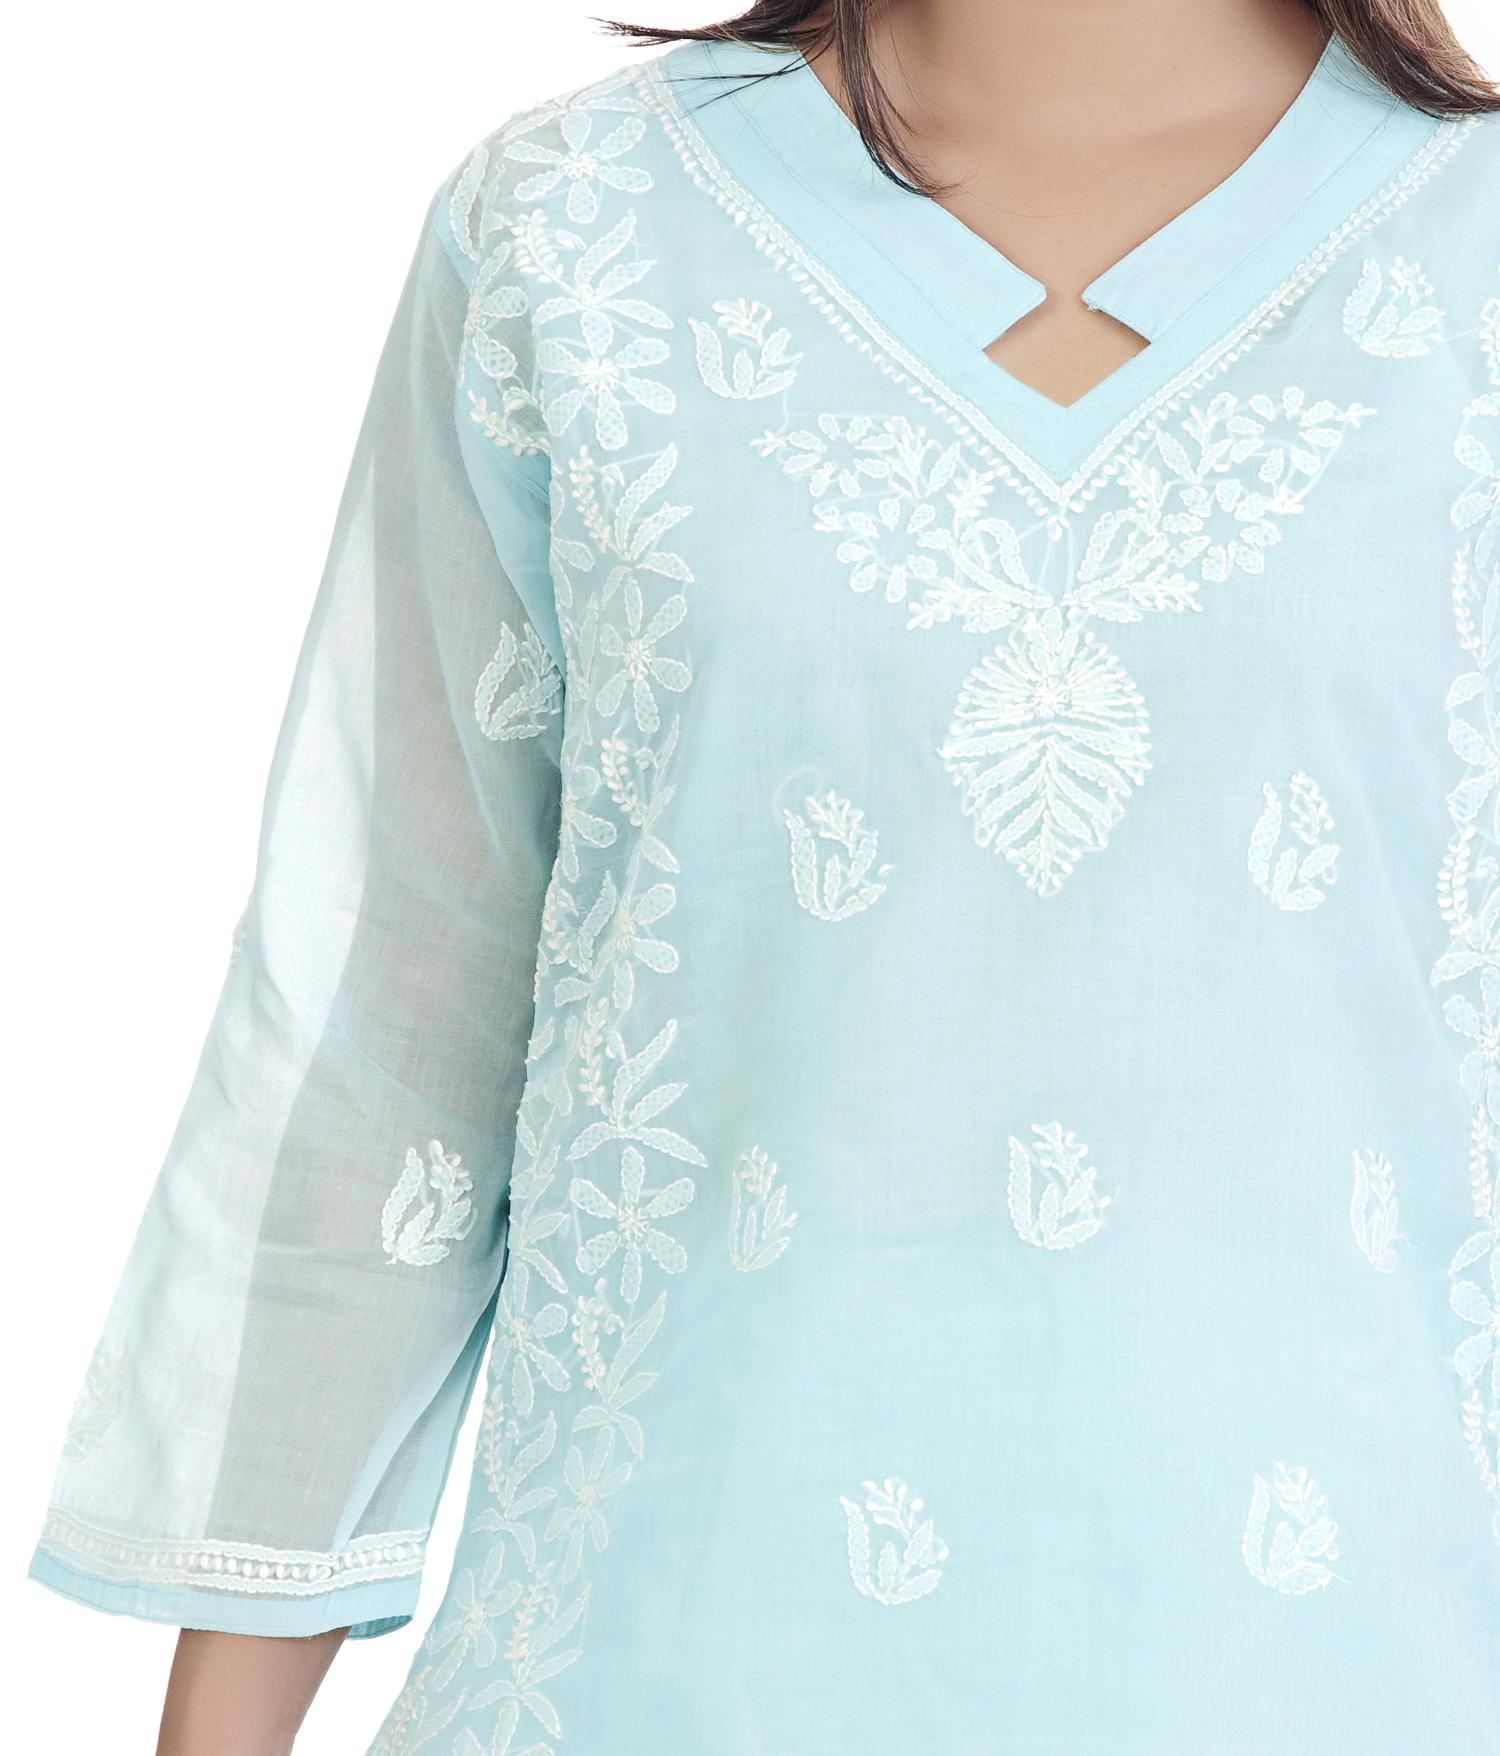 Ethnava Hand Embroidered Cotton Lucknowi Chikan Kurti